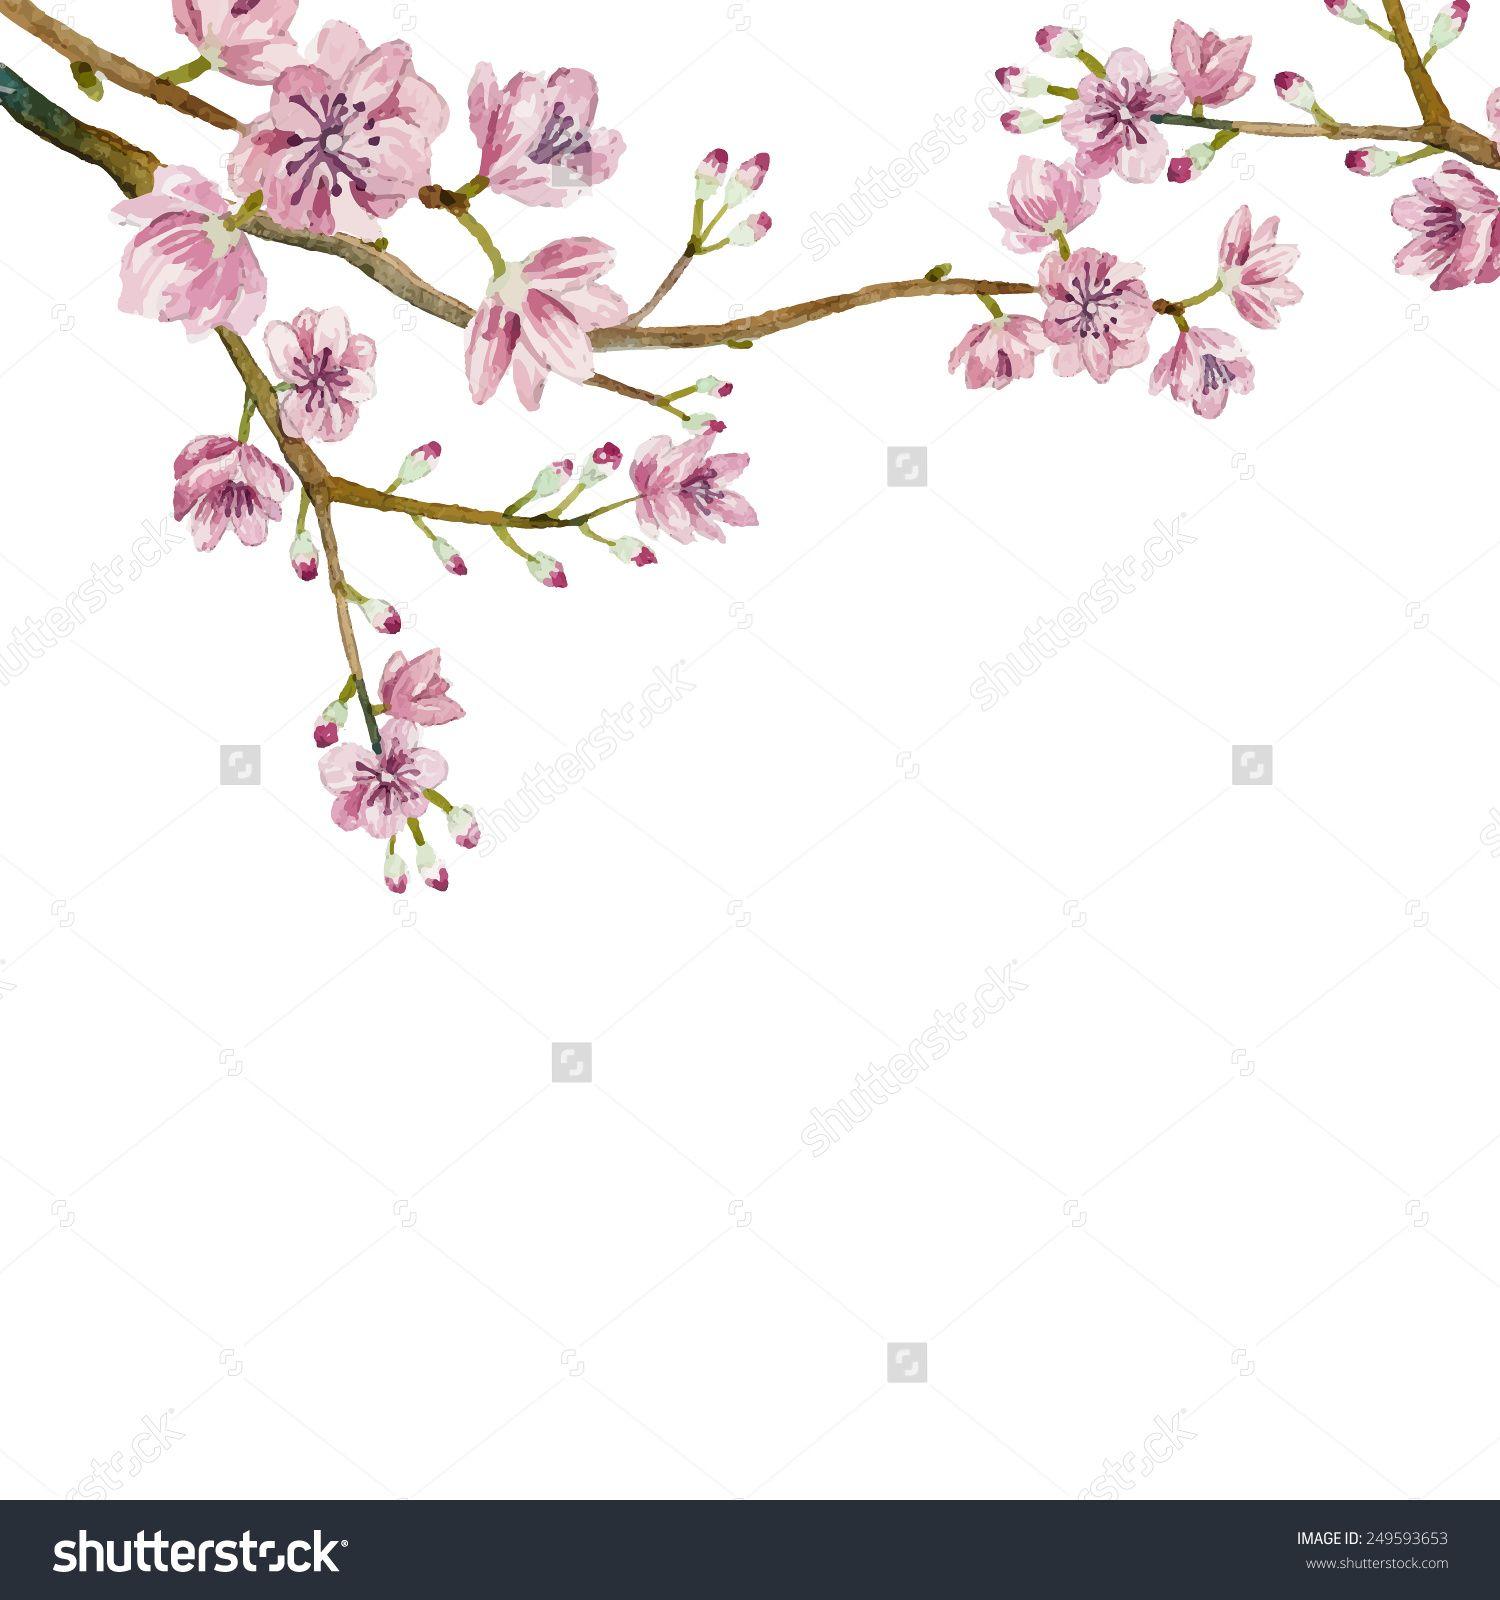 Japanese Tree Border Watercolor Sakura Frame Background With Blossom Branch Drawing Japanese Tree Art Tattoo